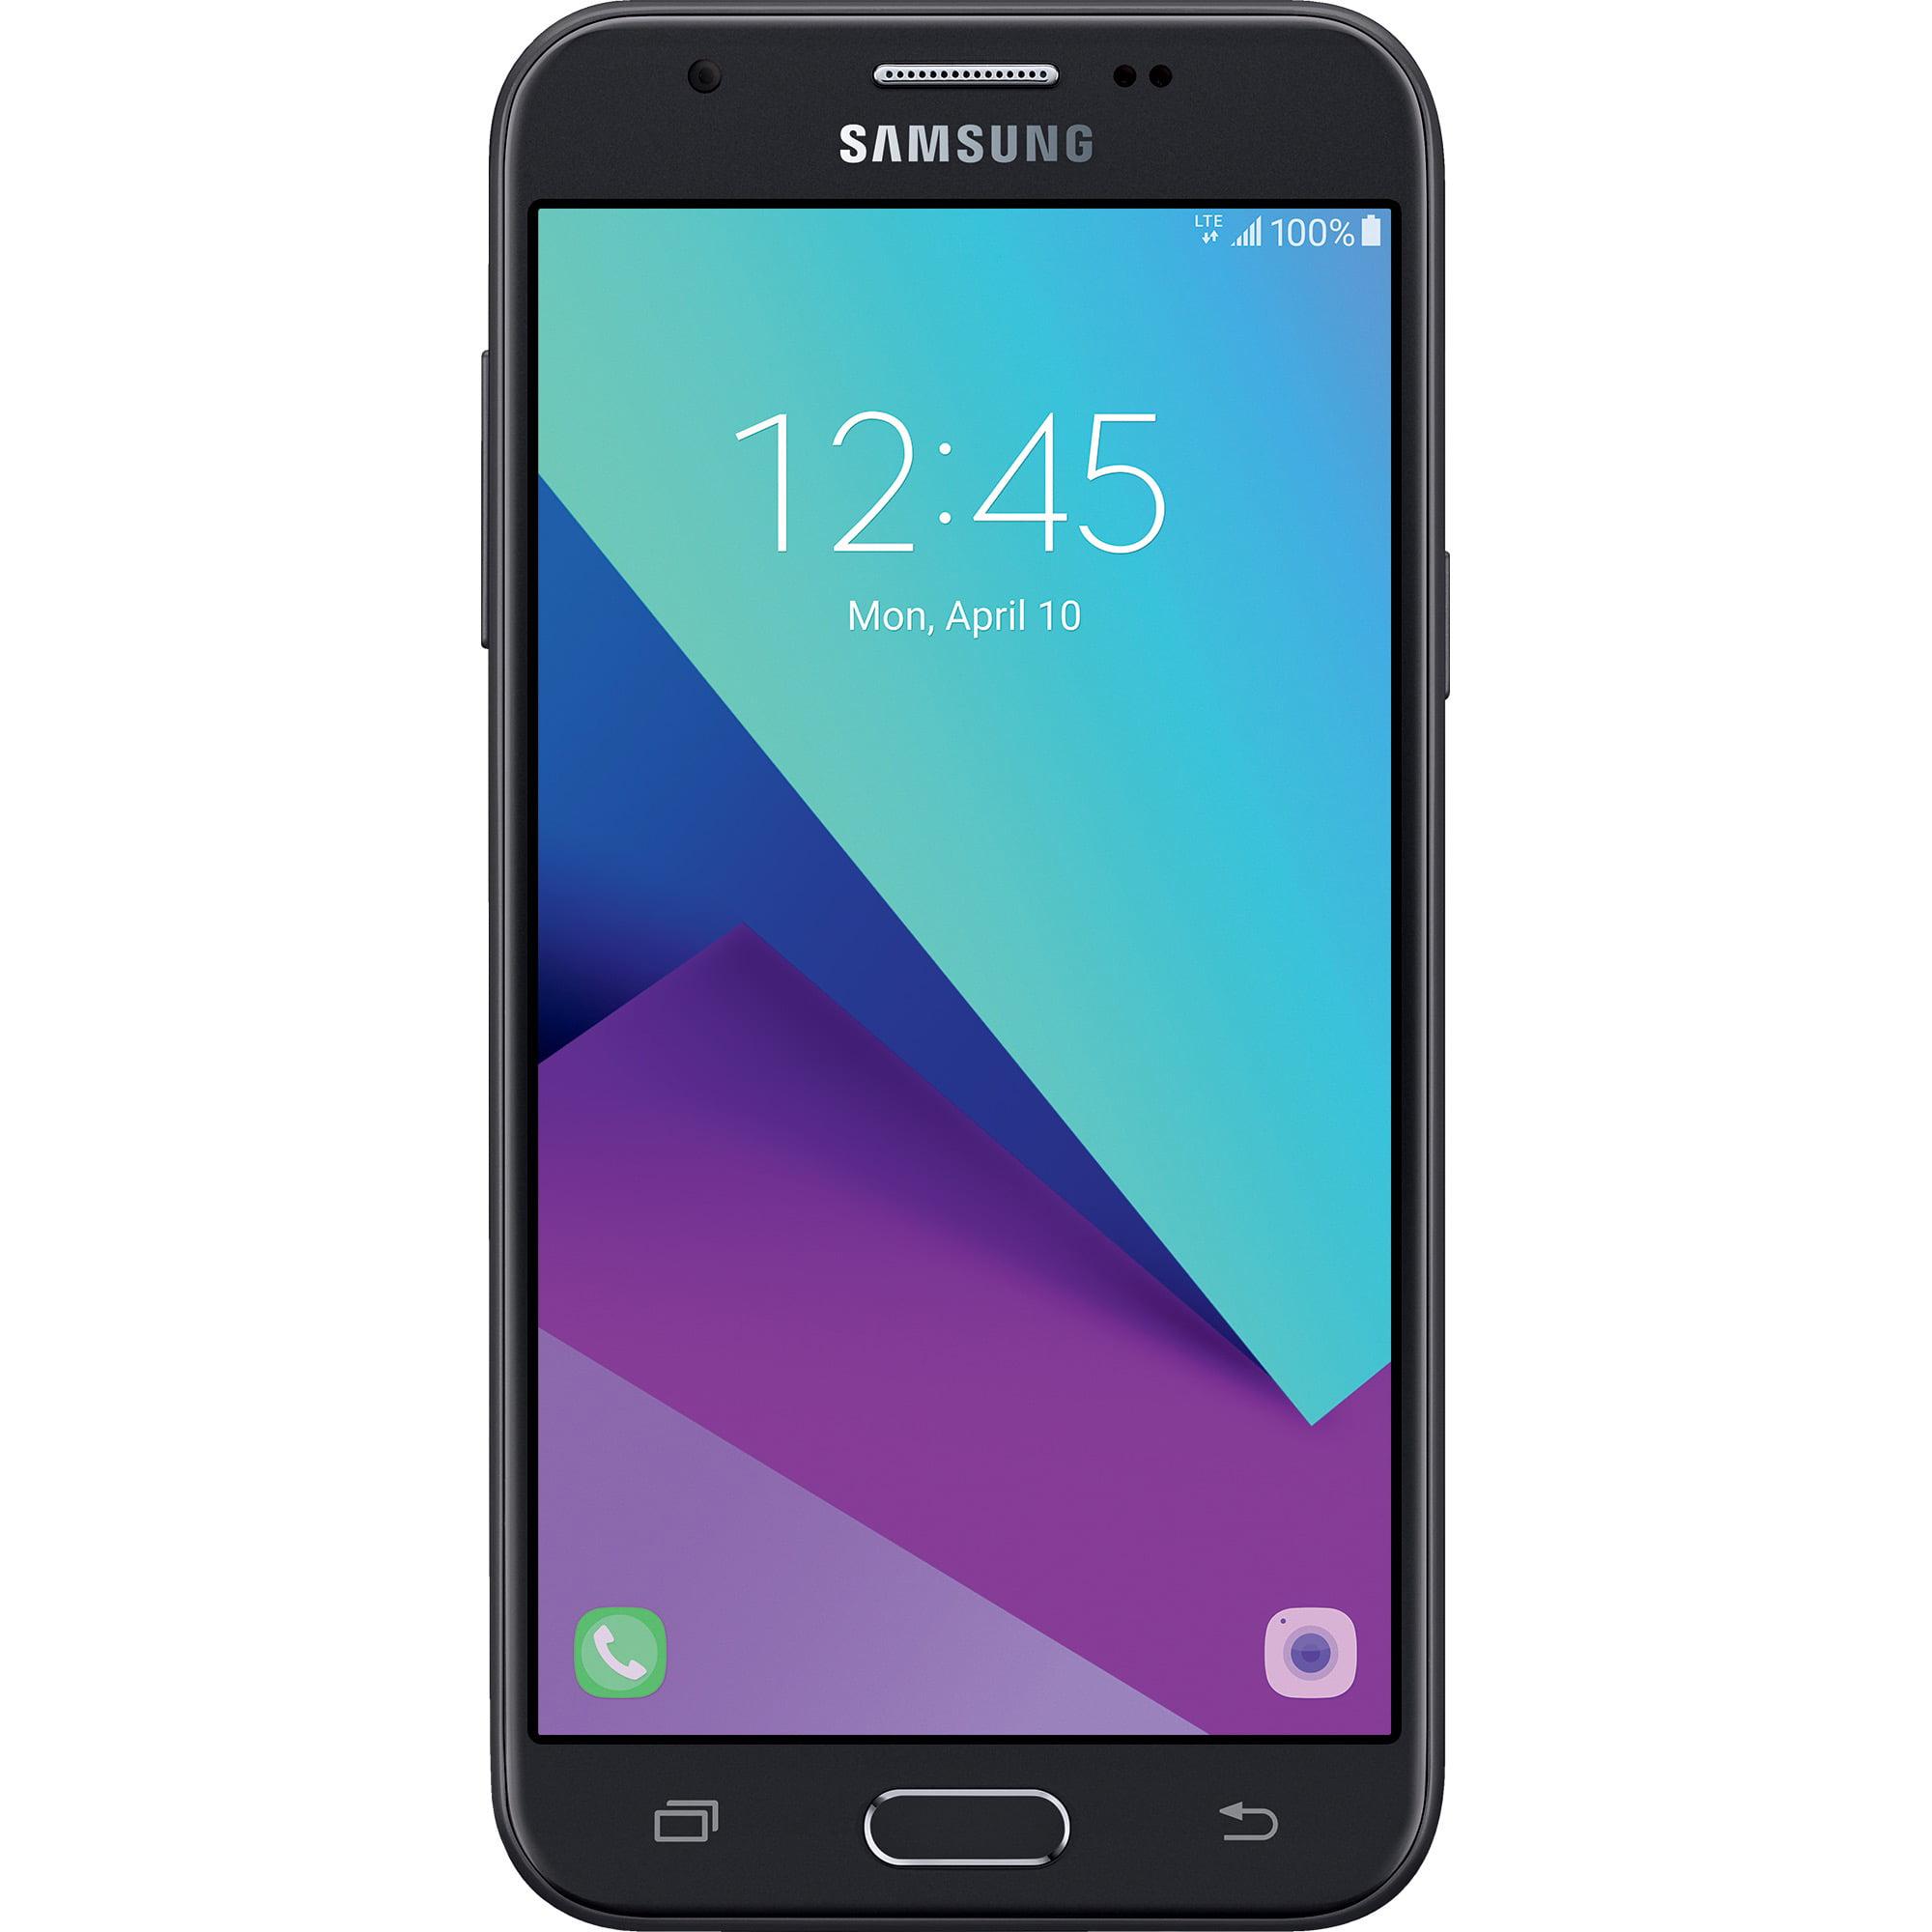 Simple Mobile Samsung S337 Luna Pro 16GB Prepaid Smartphone, Black